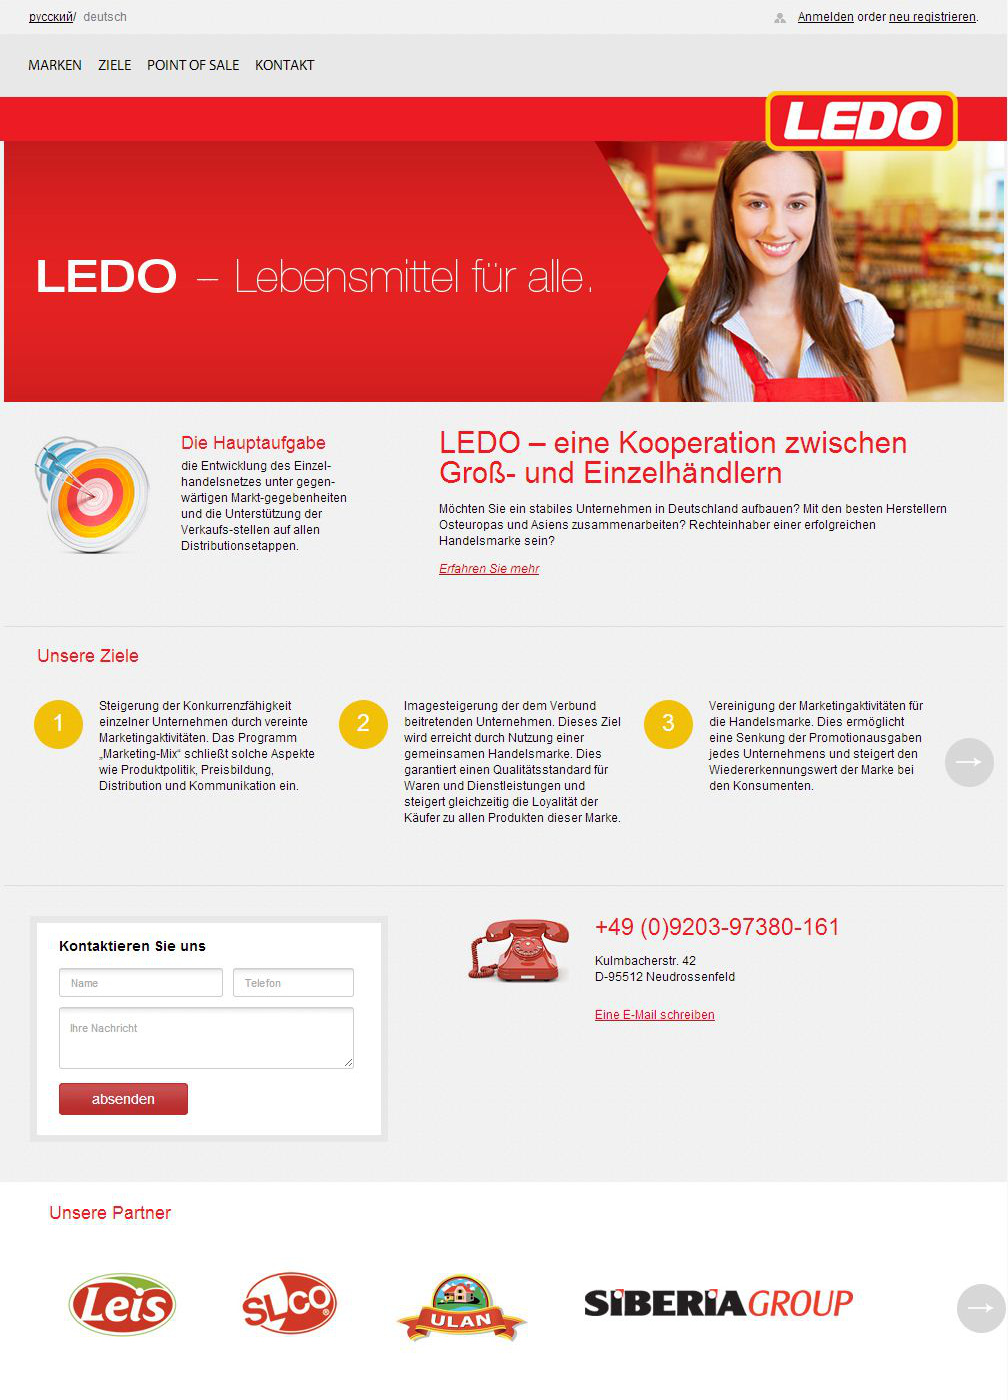 LEDO - кооперация ledomarkt.de (MODX Revolution)